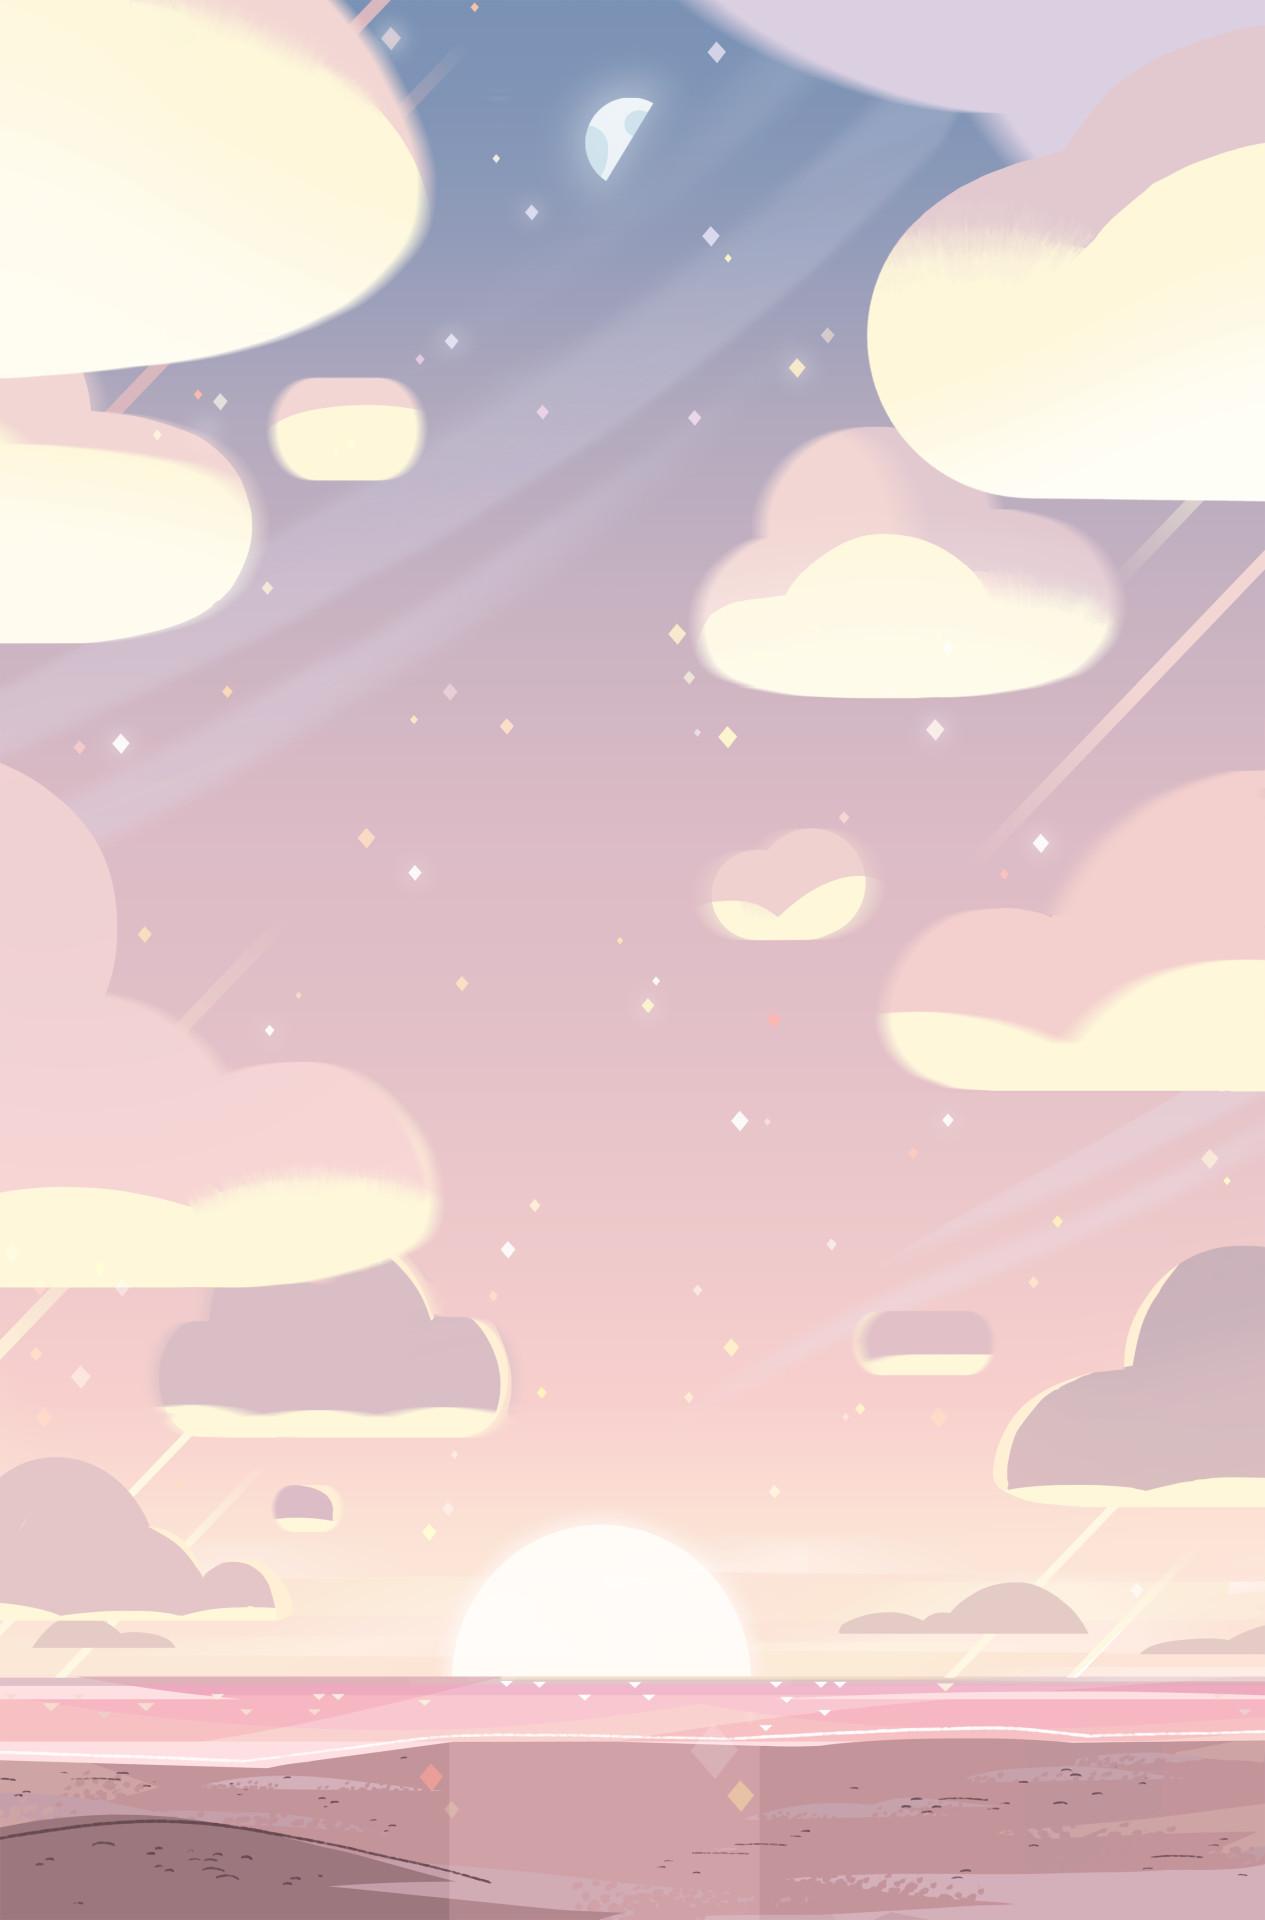 Steven Universe Iphone Wallpaper 75 Images